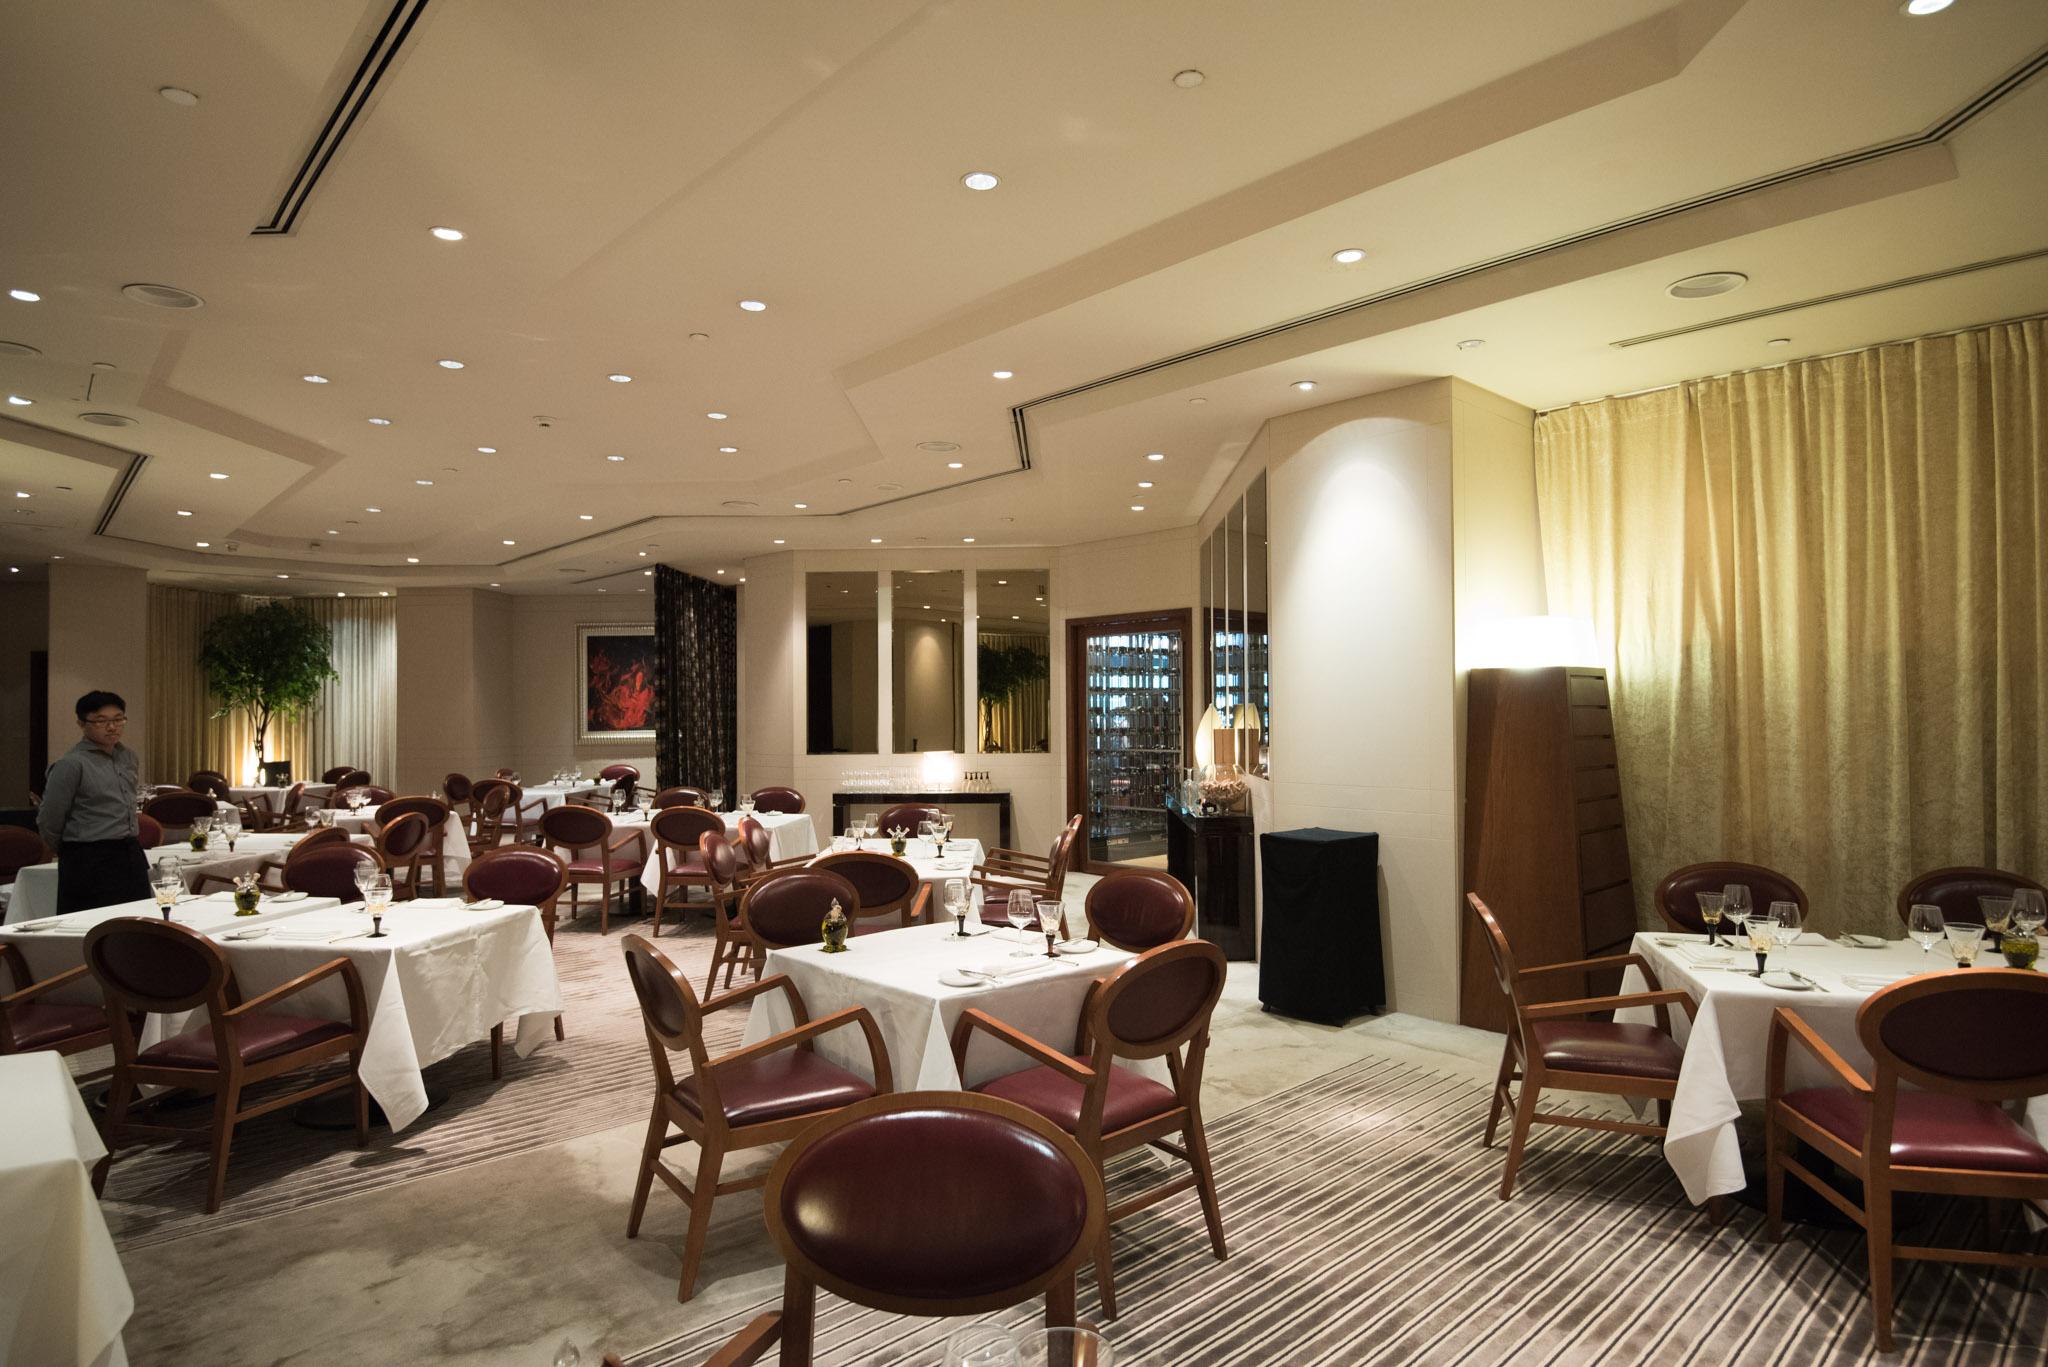 Restaurant  DOMVS, The Italian Restaurant - Sheraton Towers Singapore